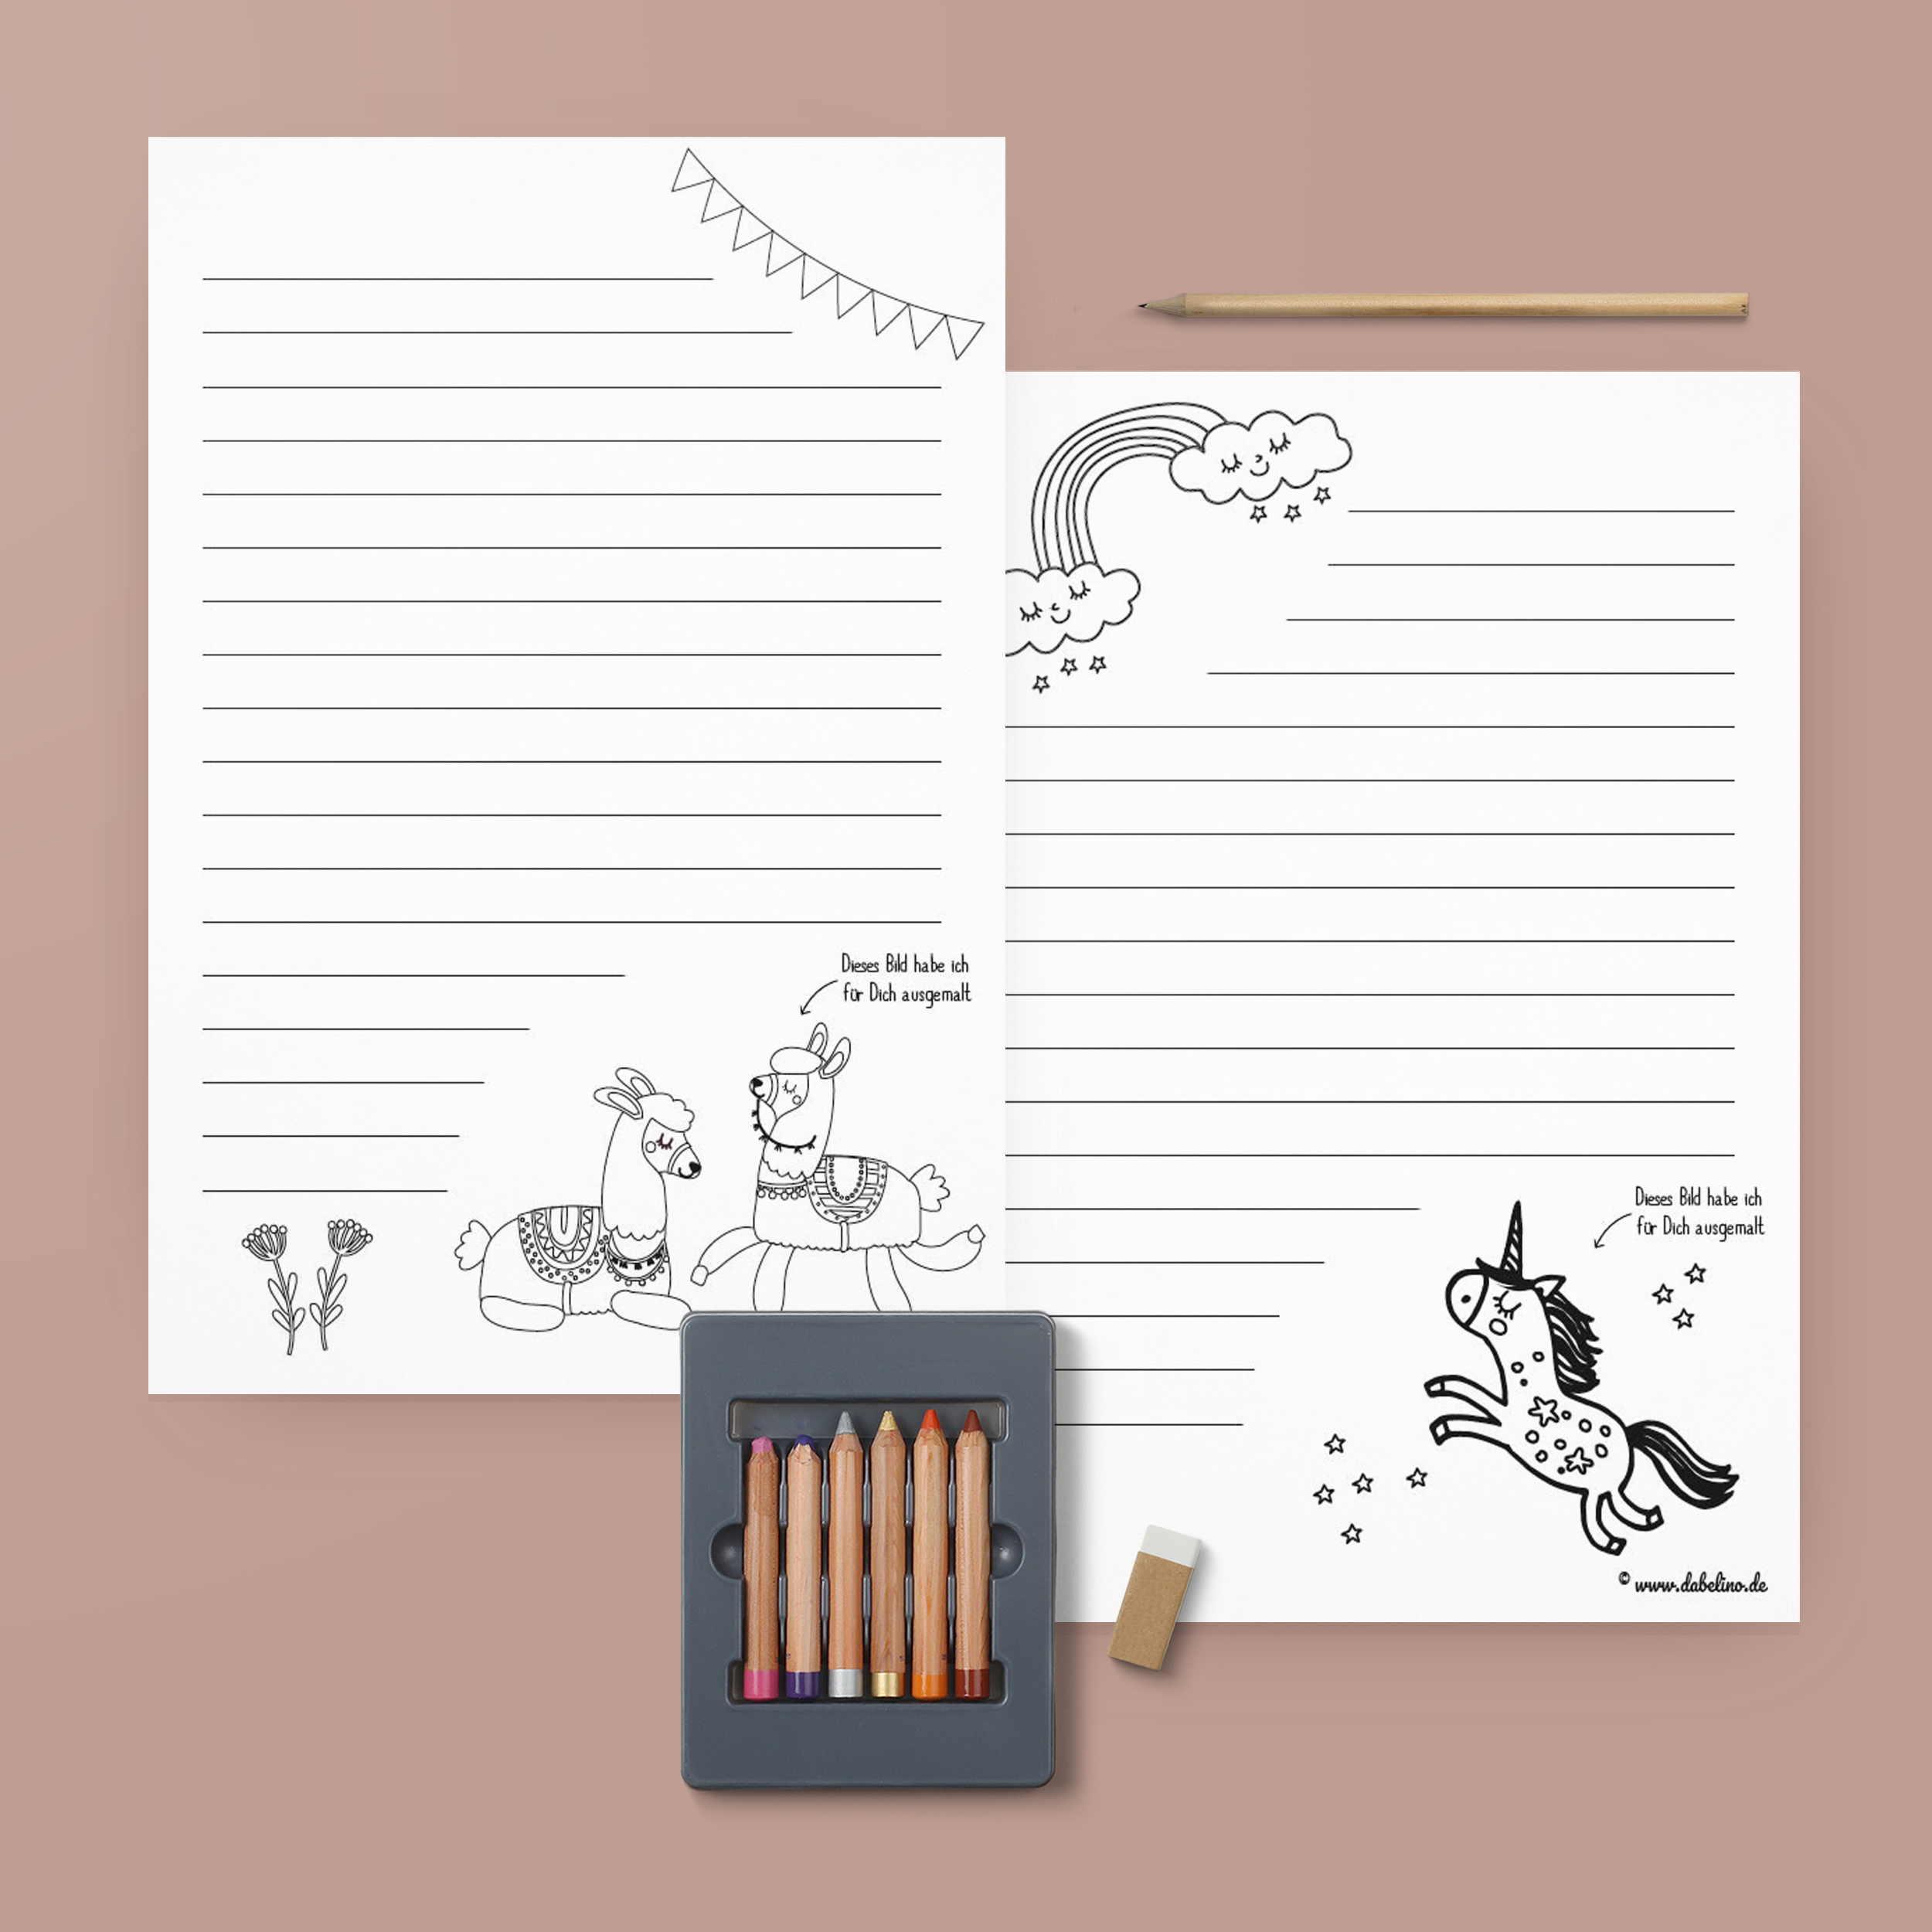 briefpapier vorlage kinder